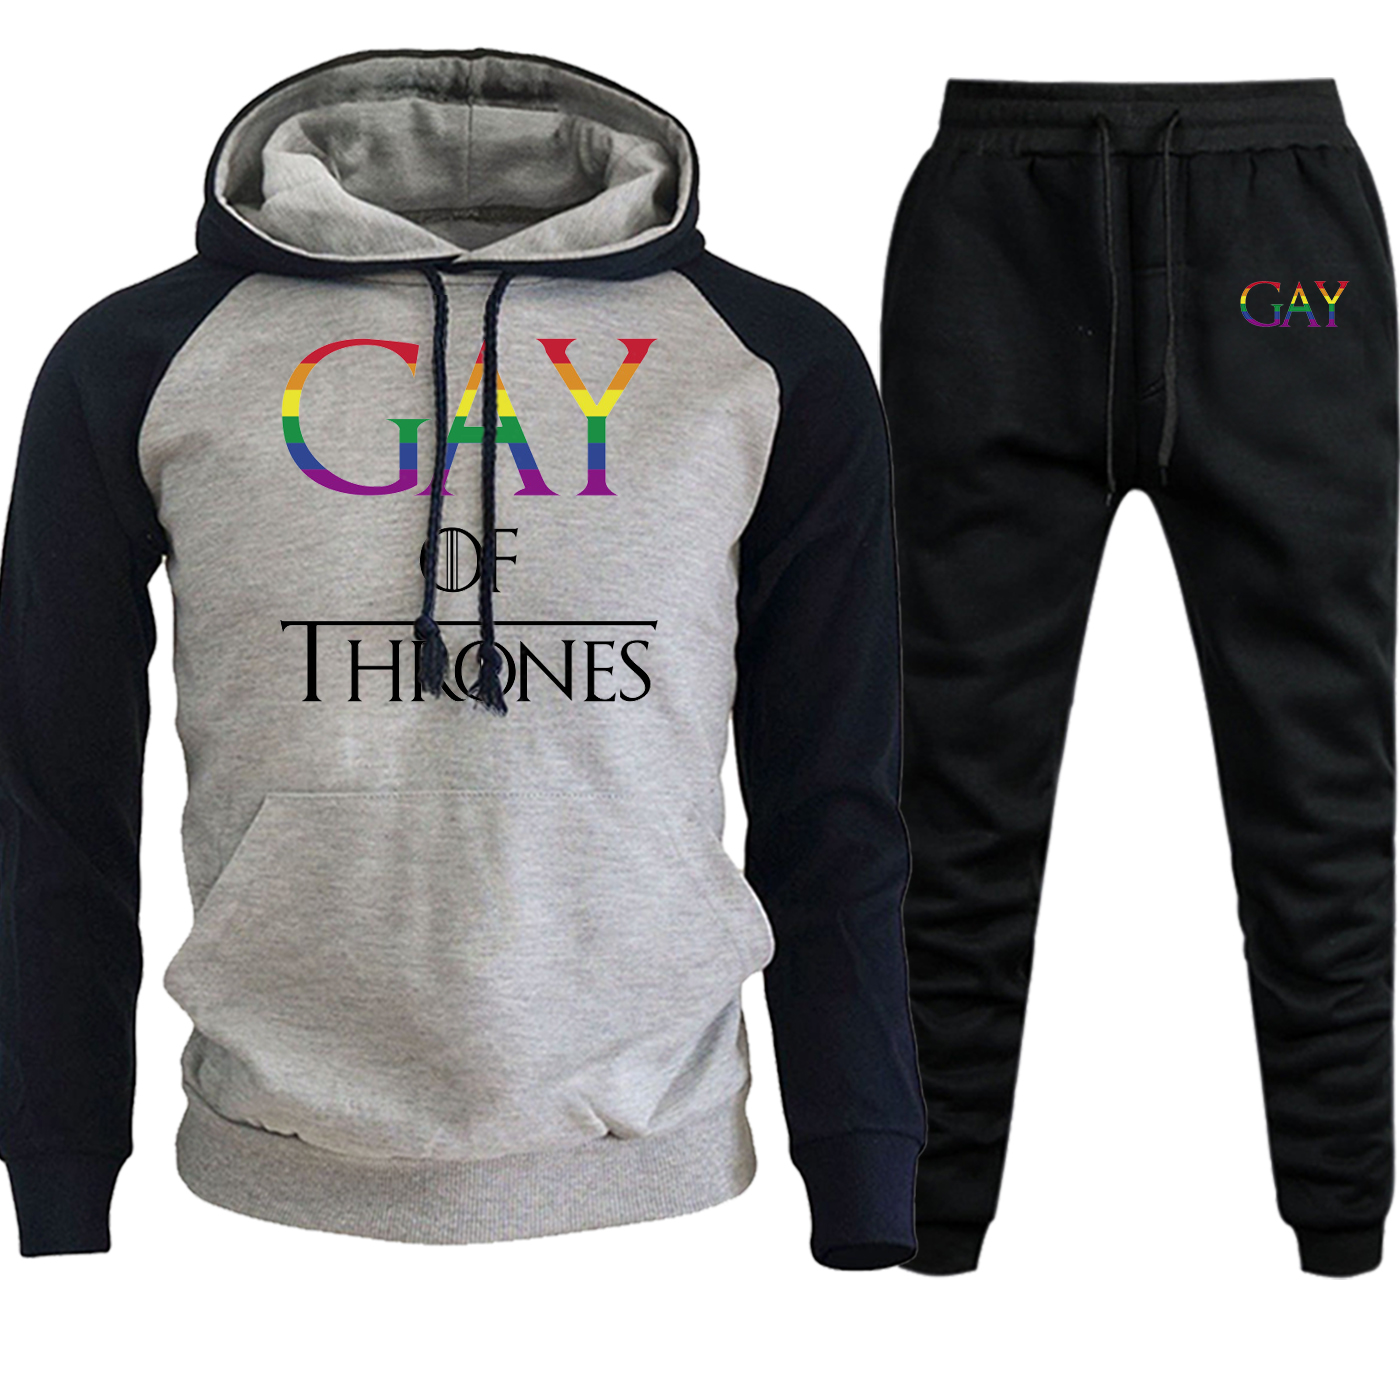 Gay Of Thrones Gay Pride Autumn Winter 2019 Harajuku Print Streetwear Raglan Men Hoodies Casula Suit Pullover+Pants 2 Piece Set